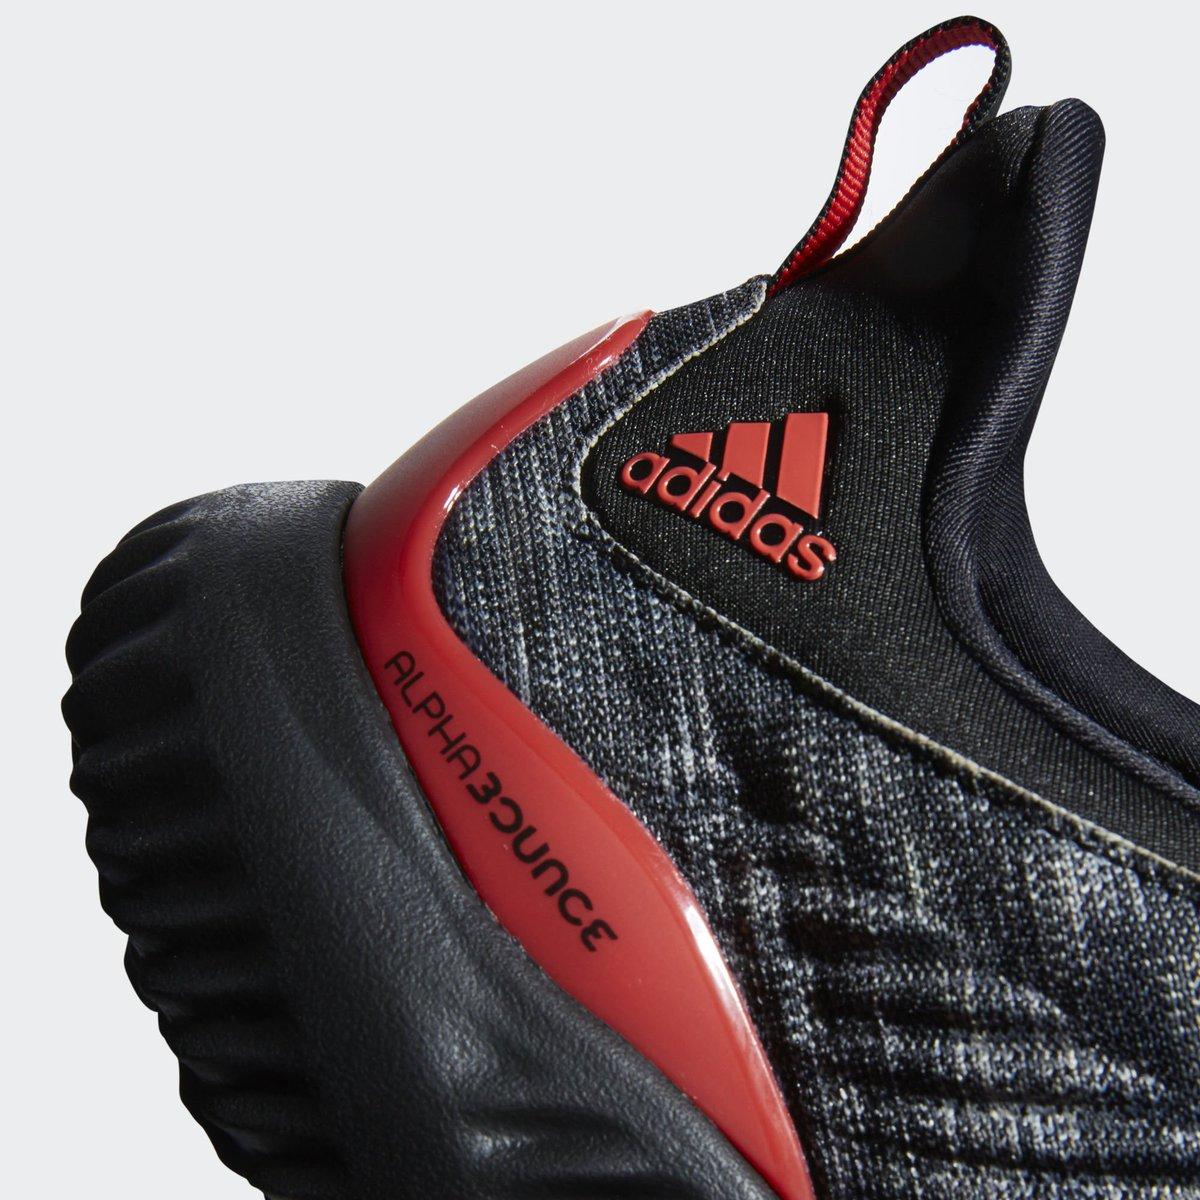 92890f22796c4 adidas alerts on Twitter